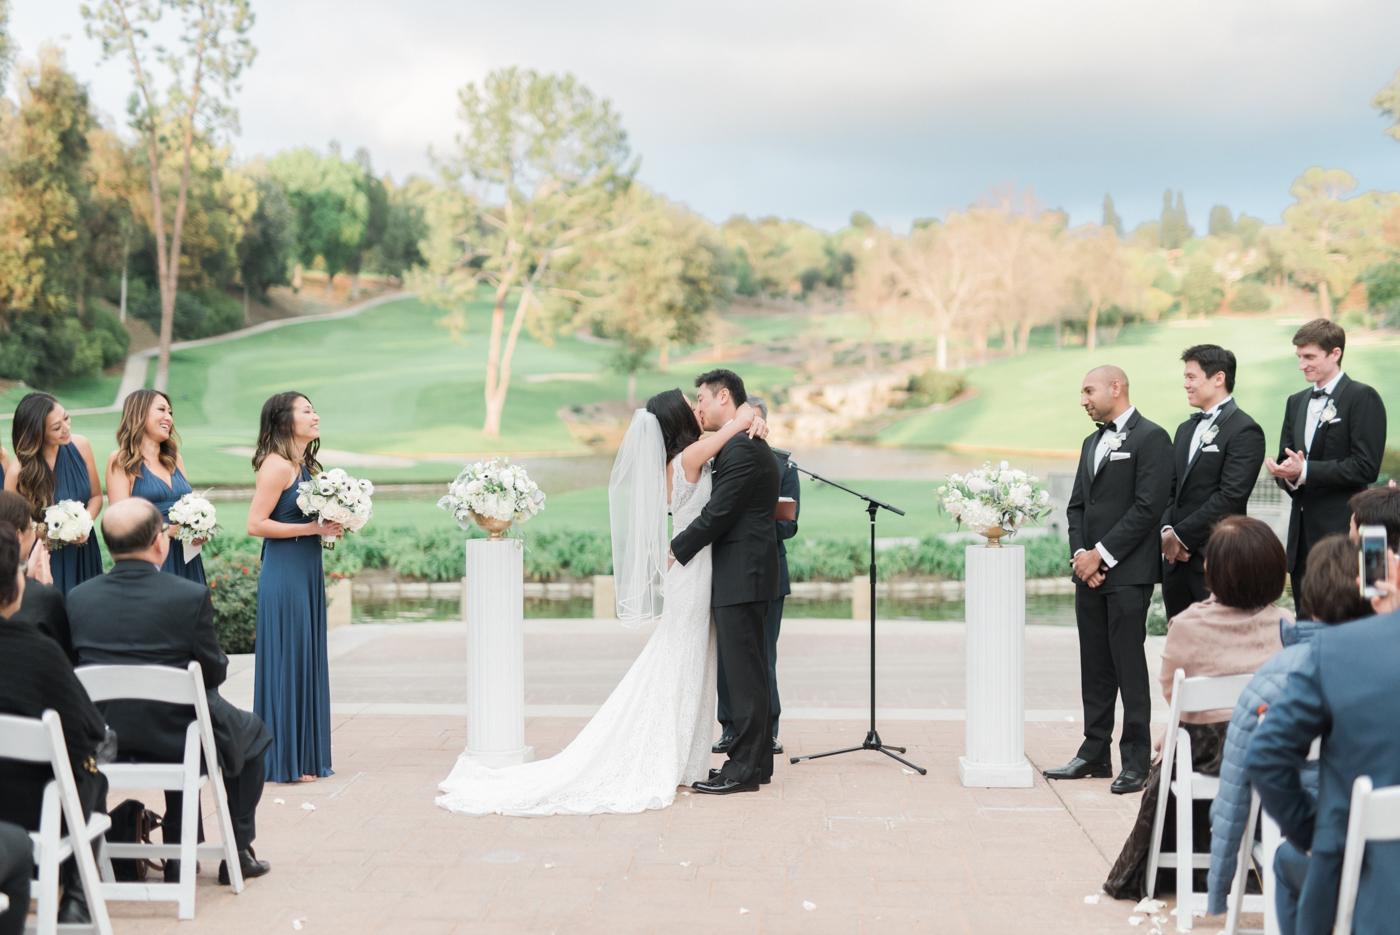 Friendly_Hills_Country_Club_fine_art_wedding_photographer_los_angeles_paris-34.jpg